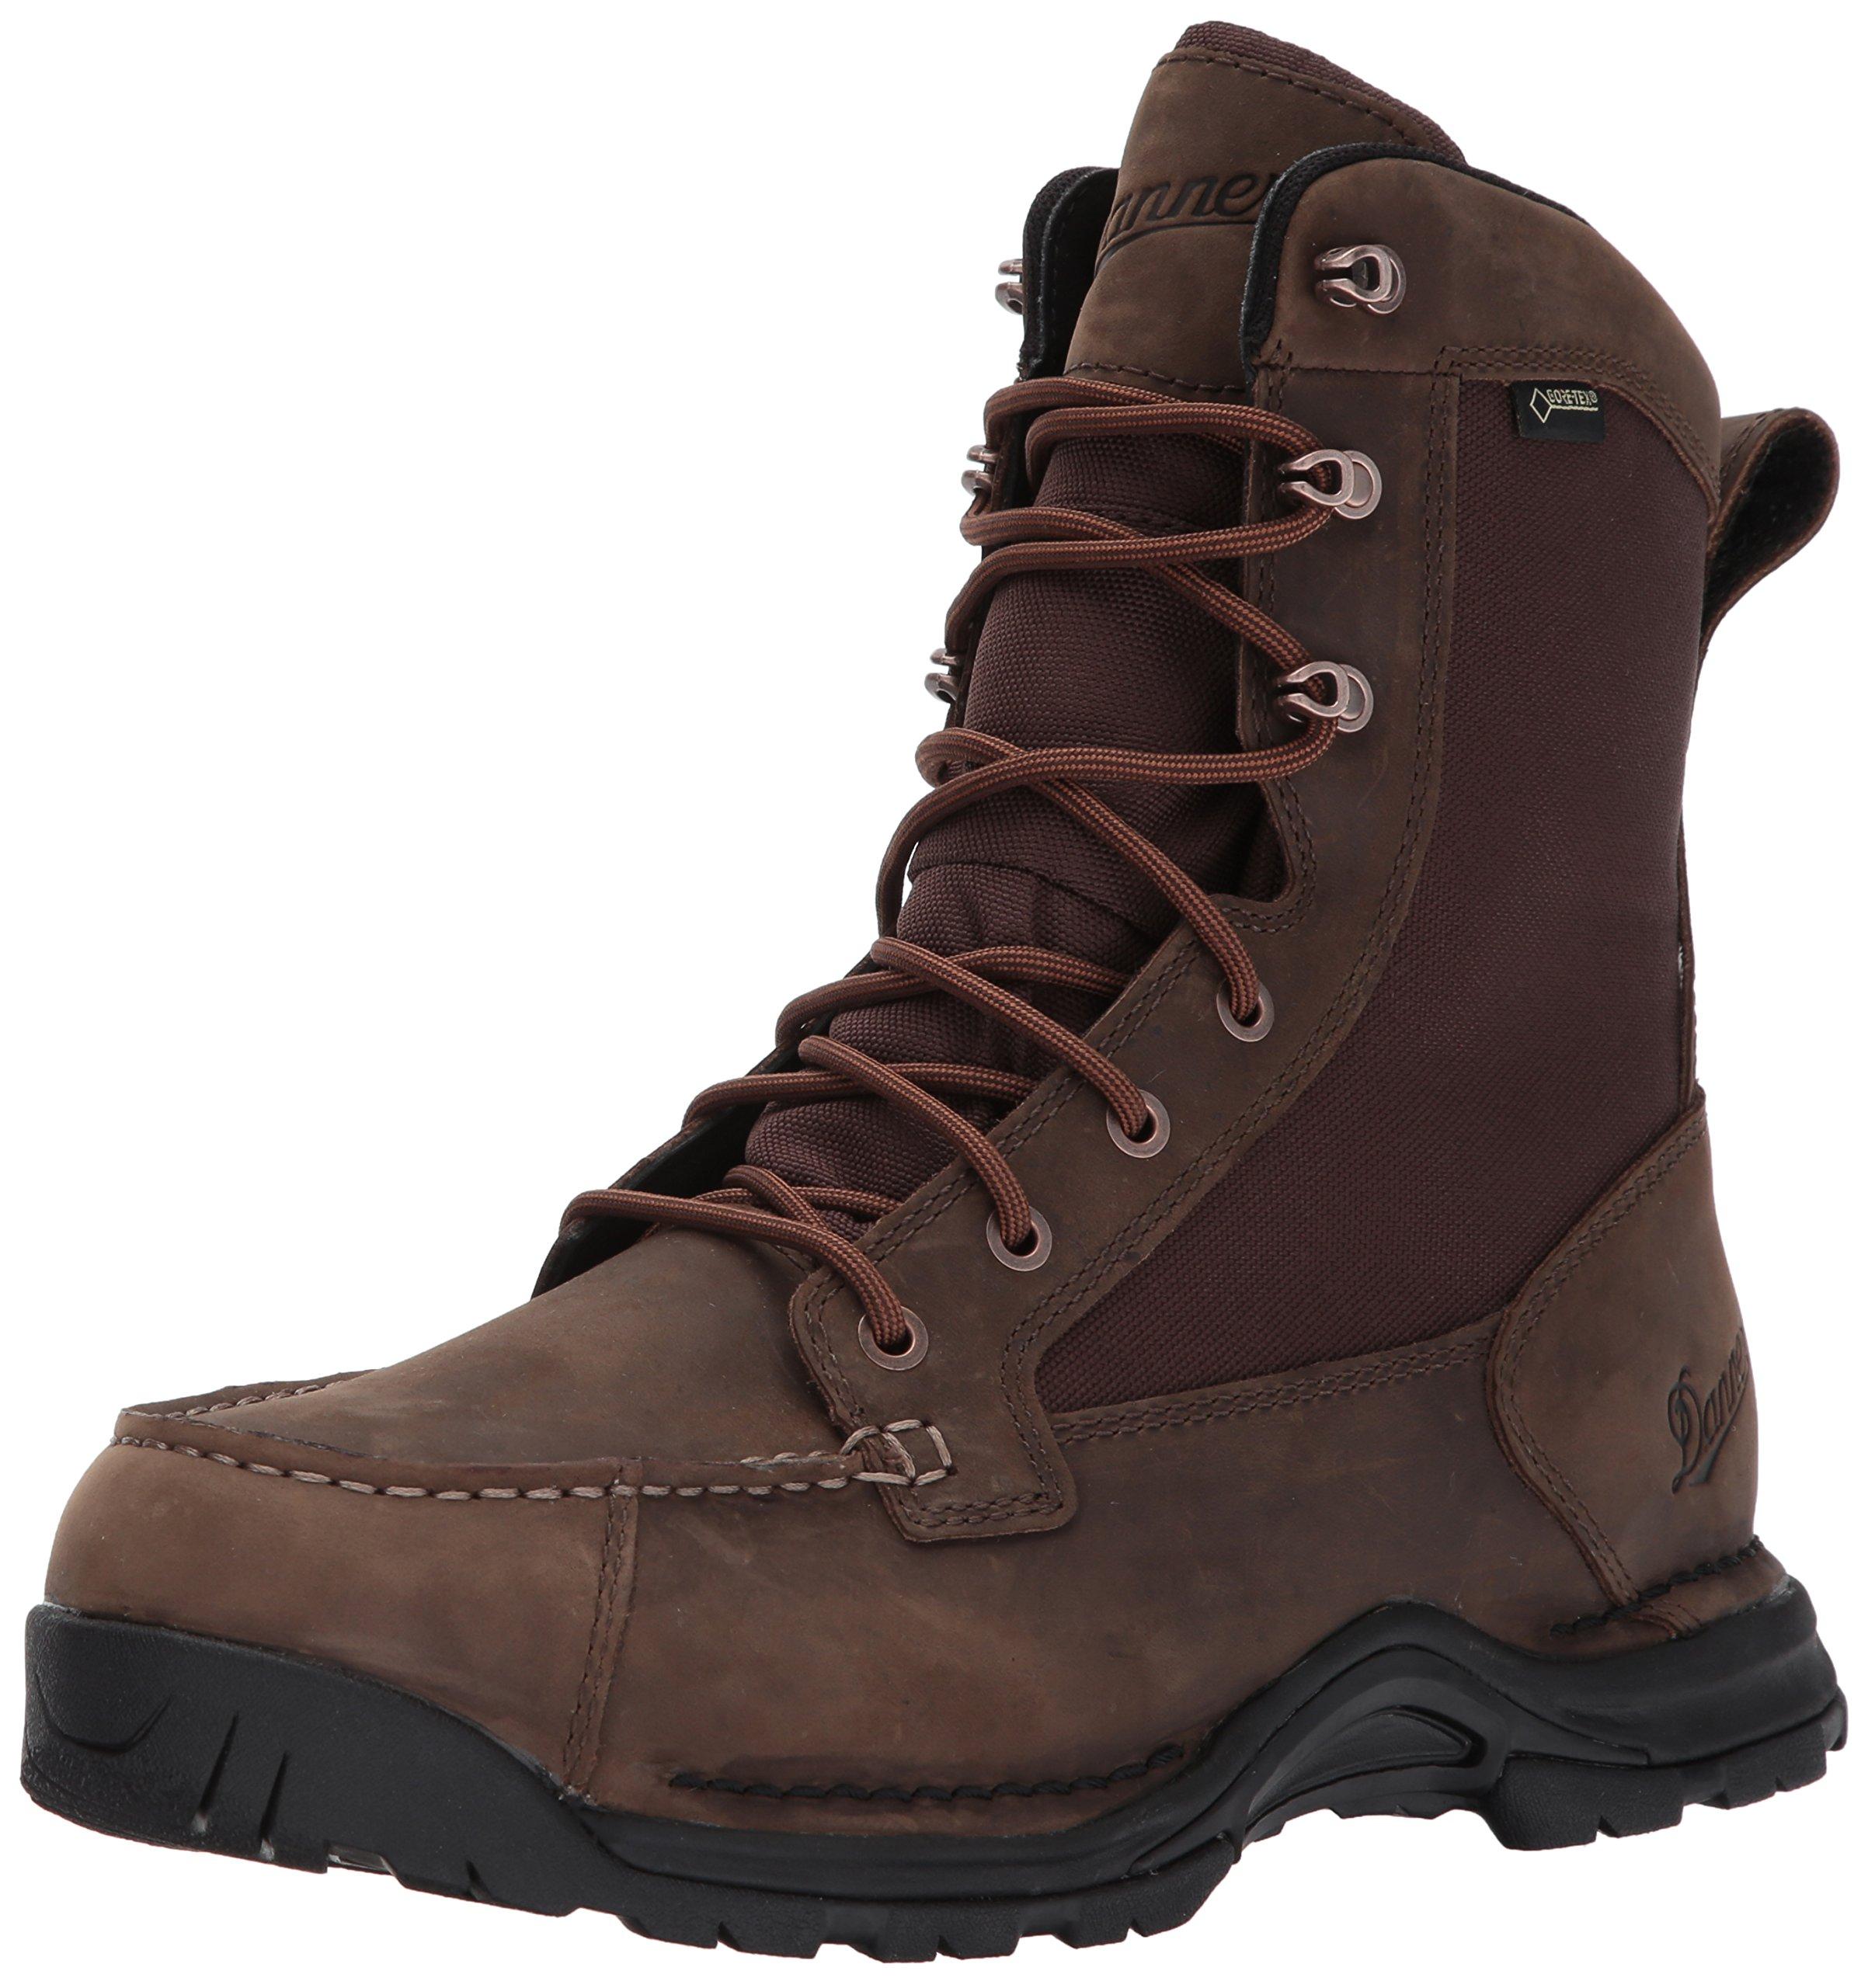 Danner Men's Sharptail Hunting Shoes, Dark Brown, 7 D US